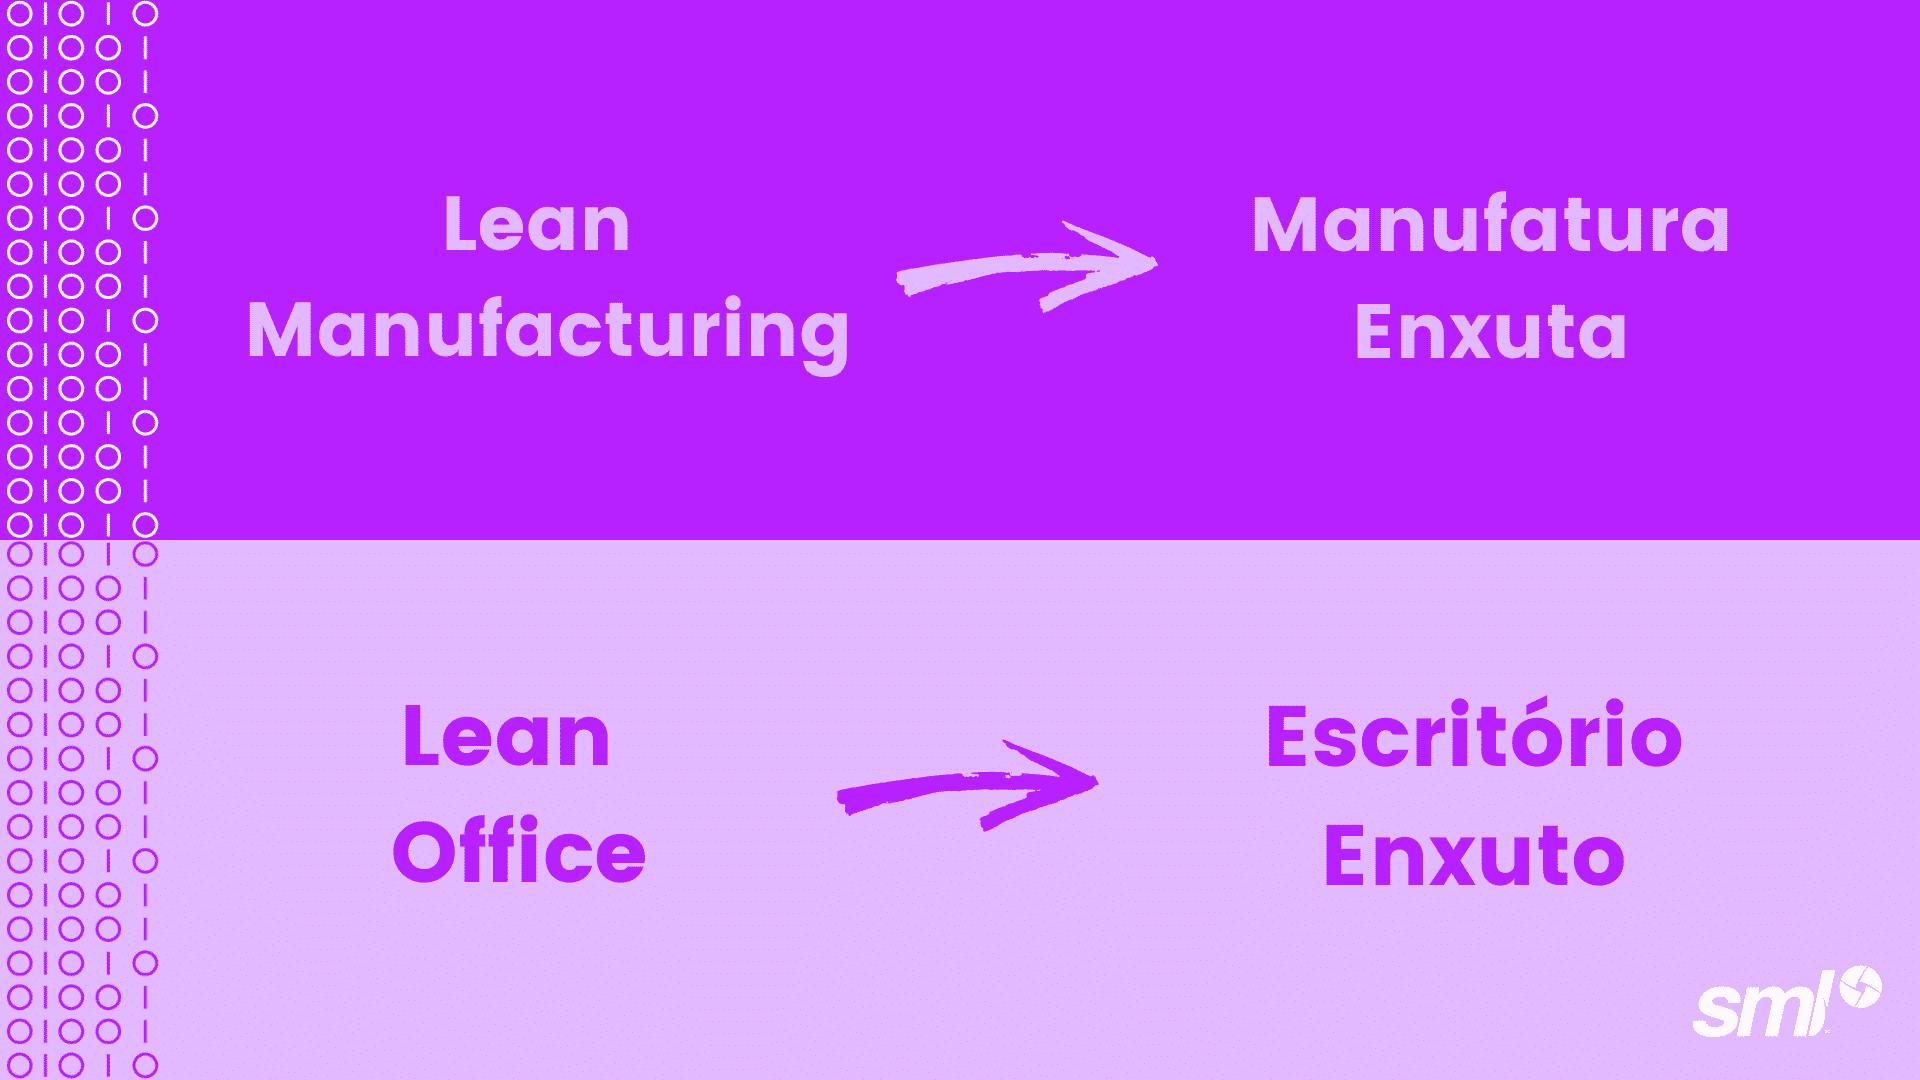 Leoffice x lean manufacturing